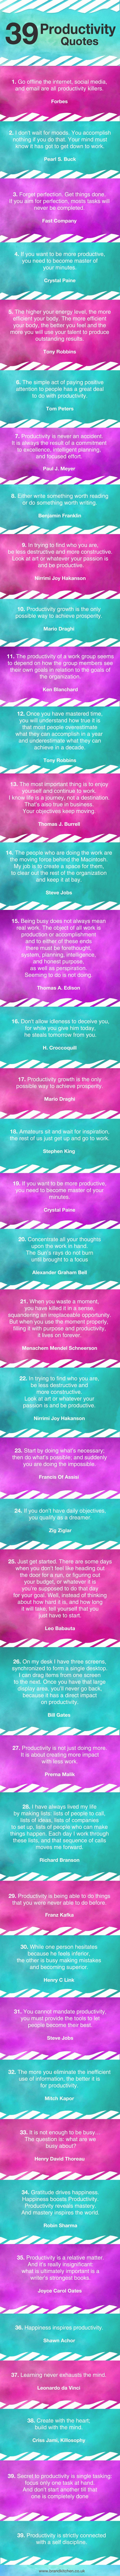 39 Productivity Quotes #quotes #infograpics #entrepreneurs #mumpreneurs